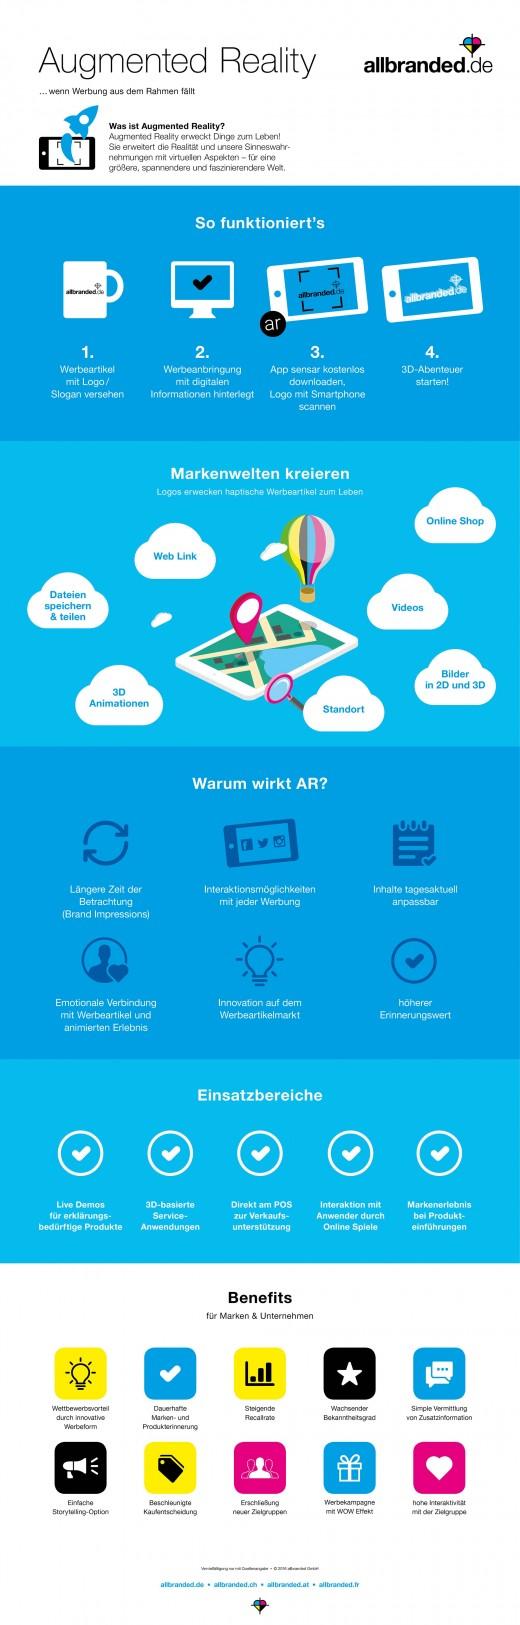 Augmented Reality Infografik allbranded